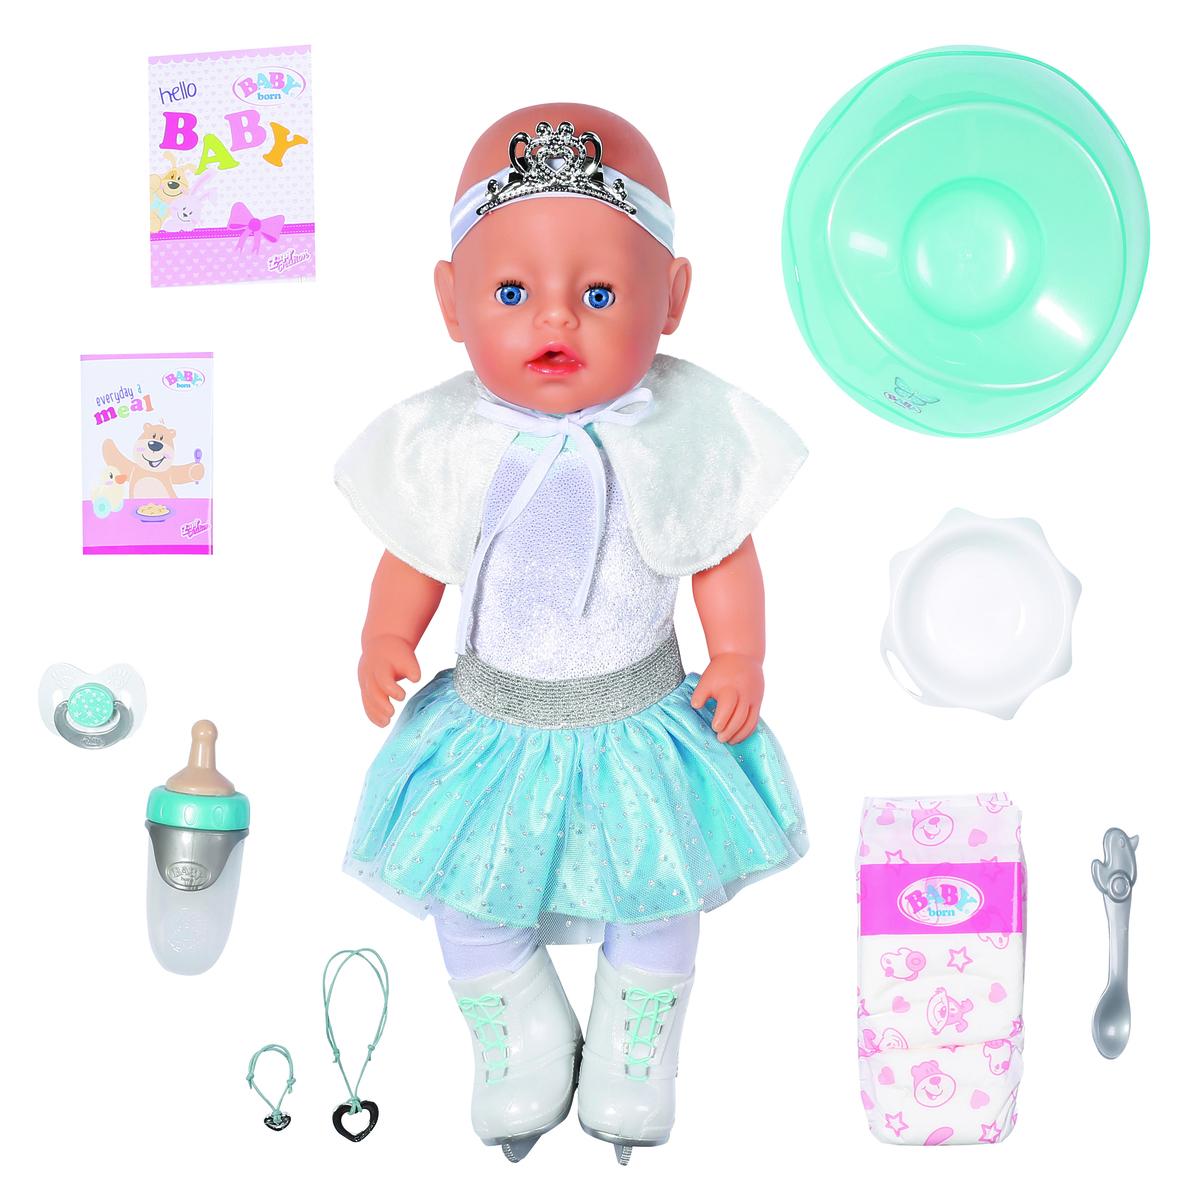 BABY Born 43cm Soft Touch Ice Ballerina Doll